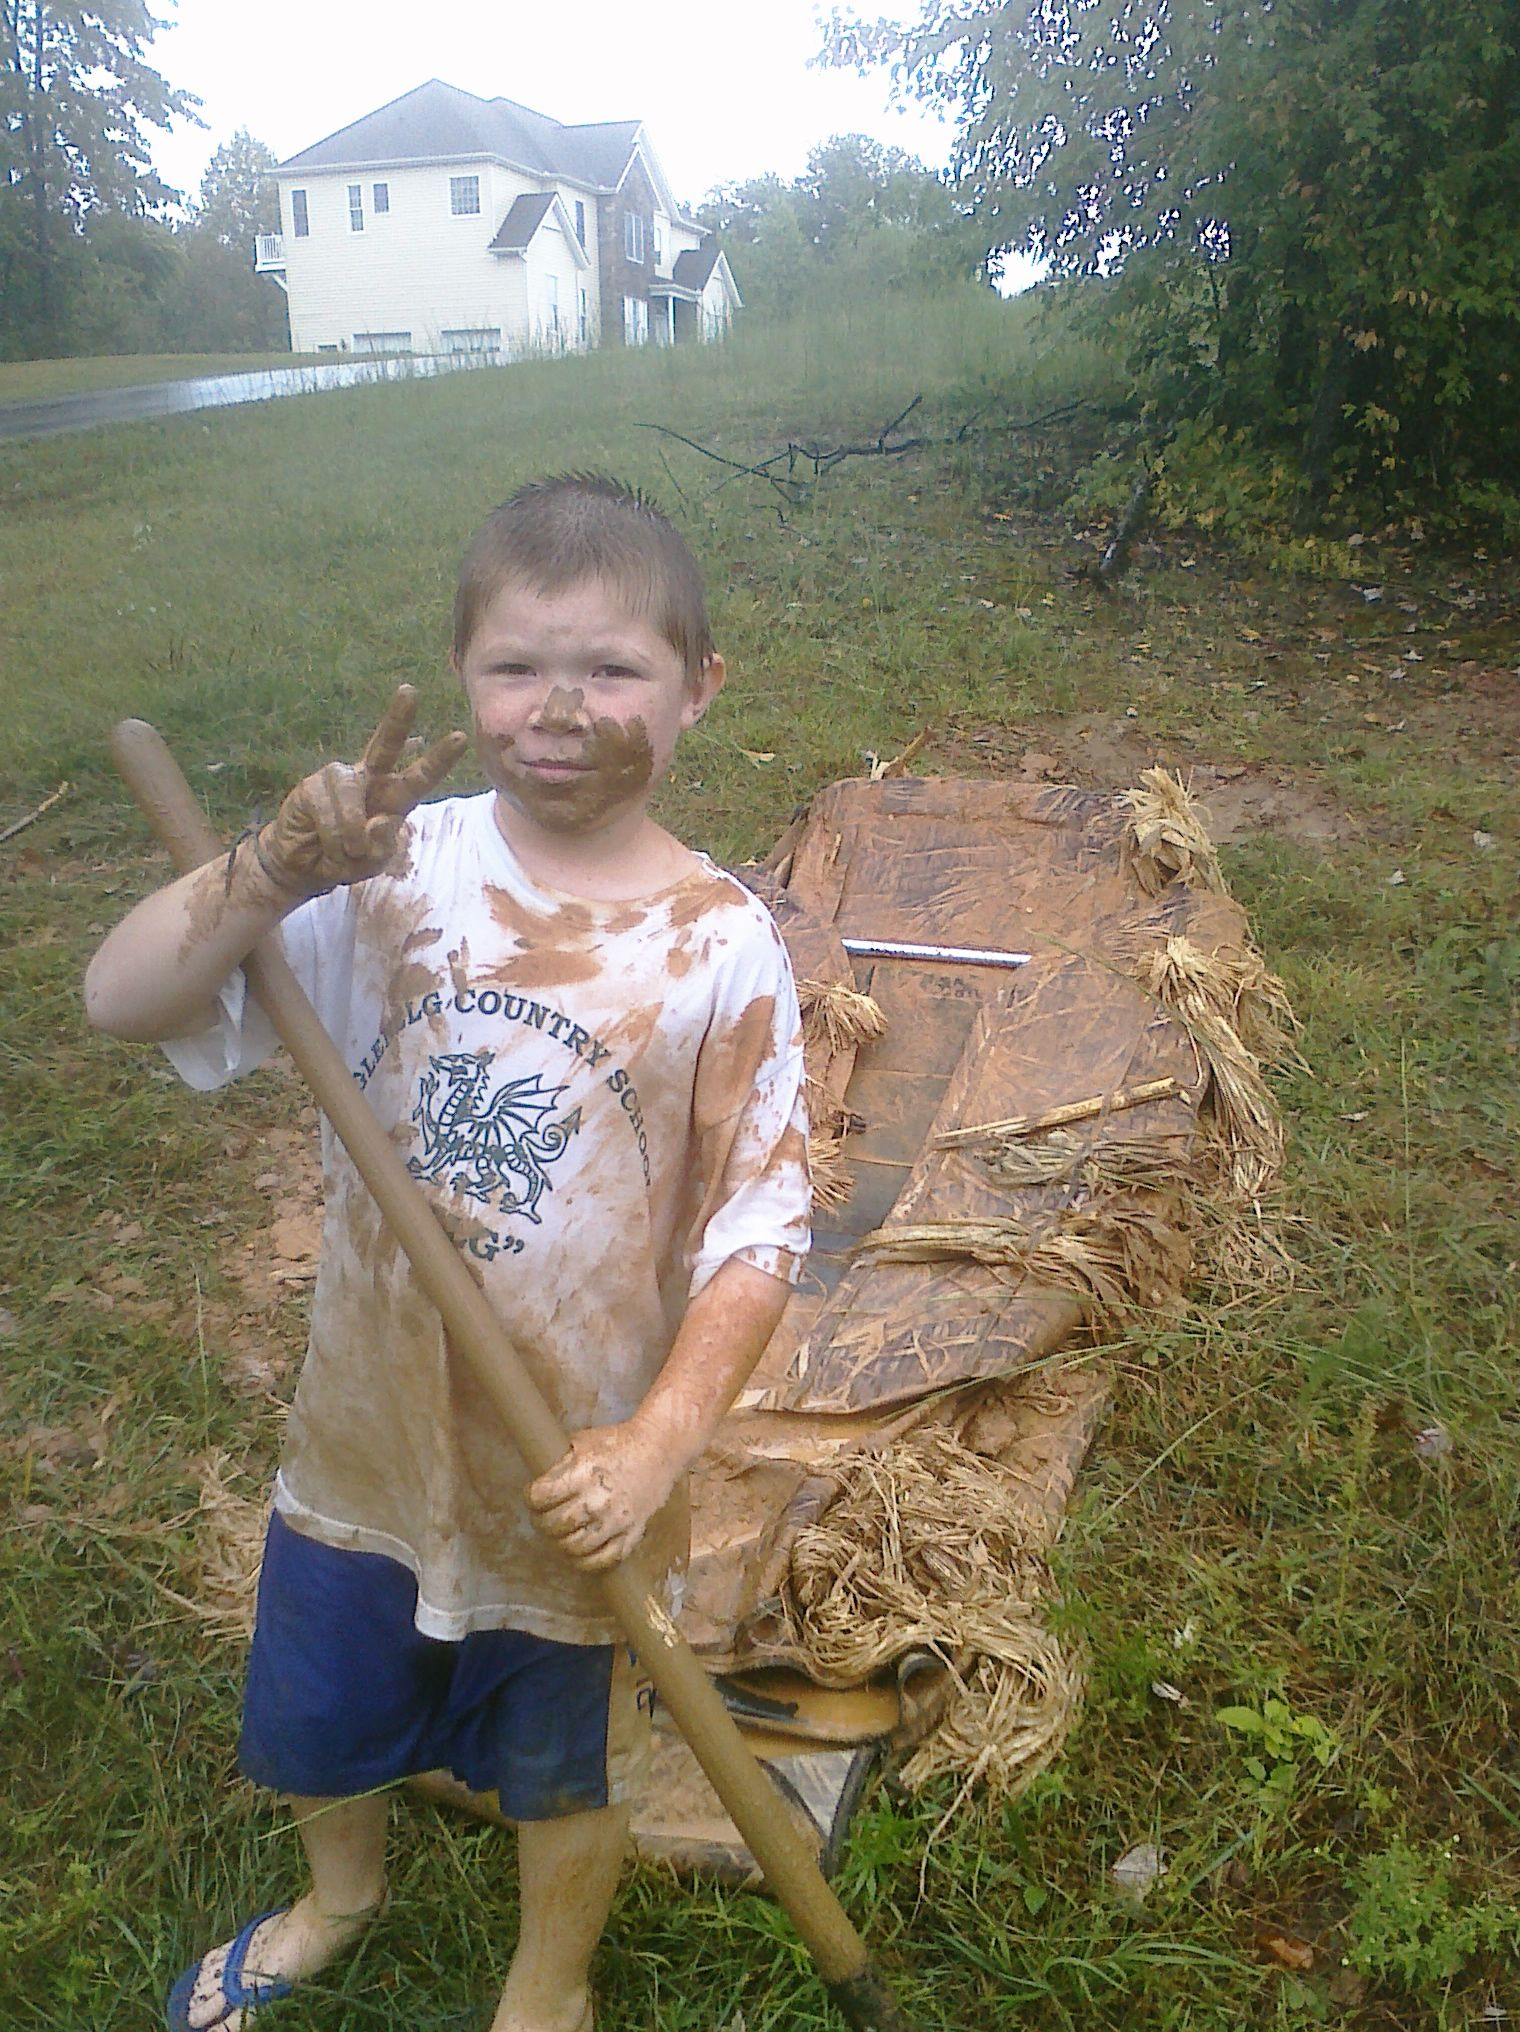 Aidan taking advantage of the rain and mud so we could